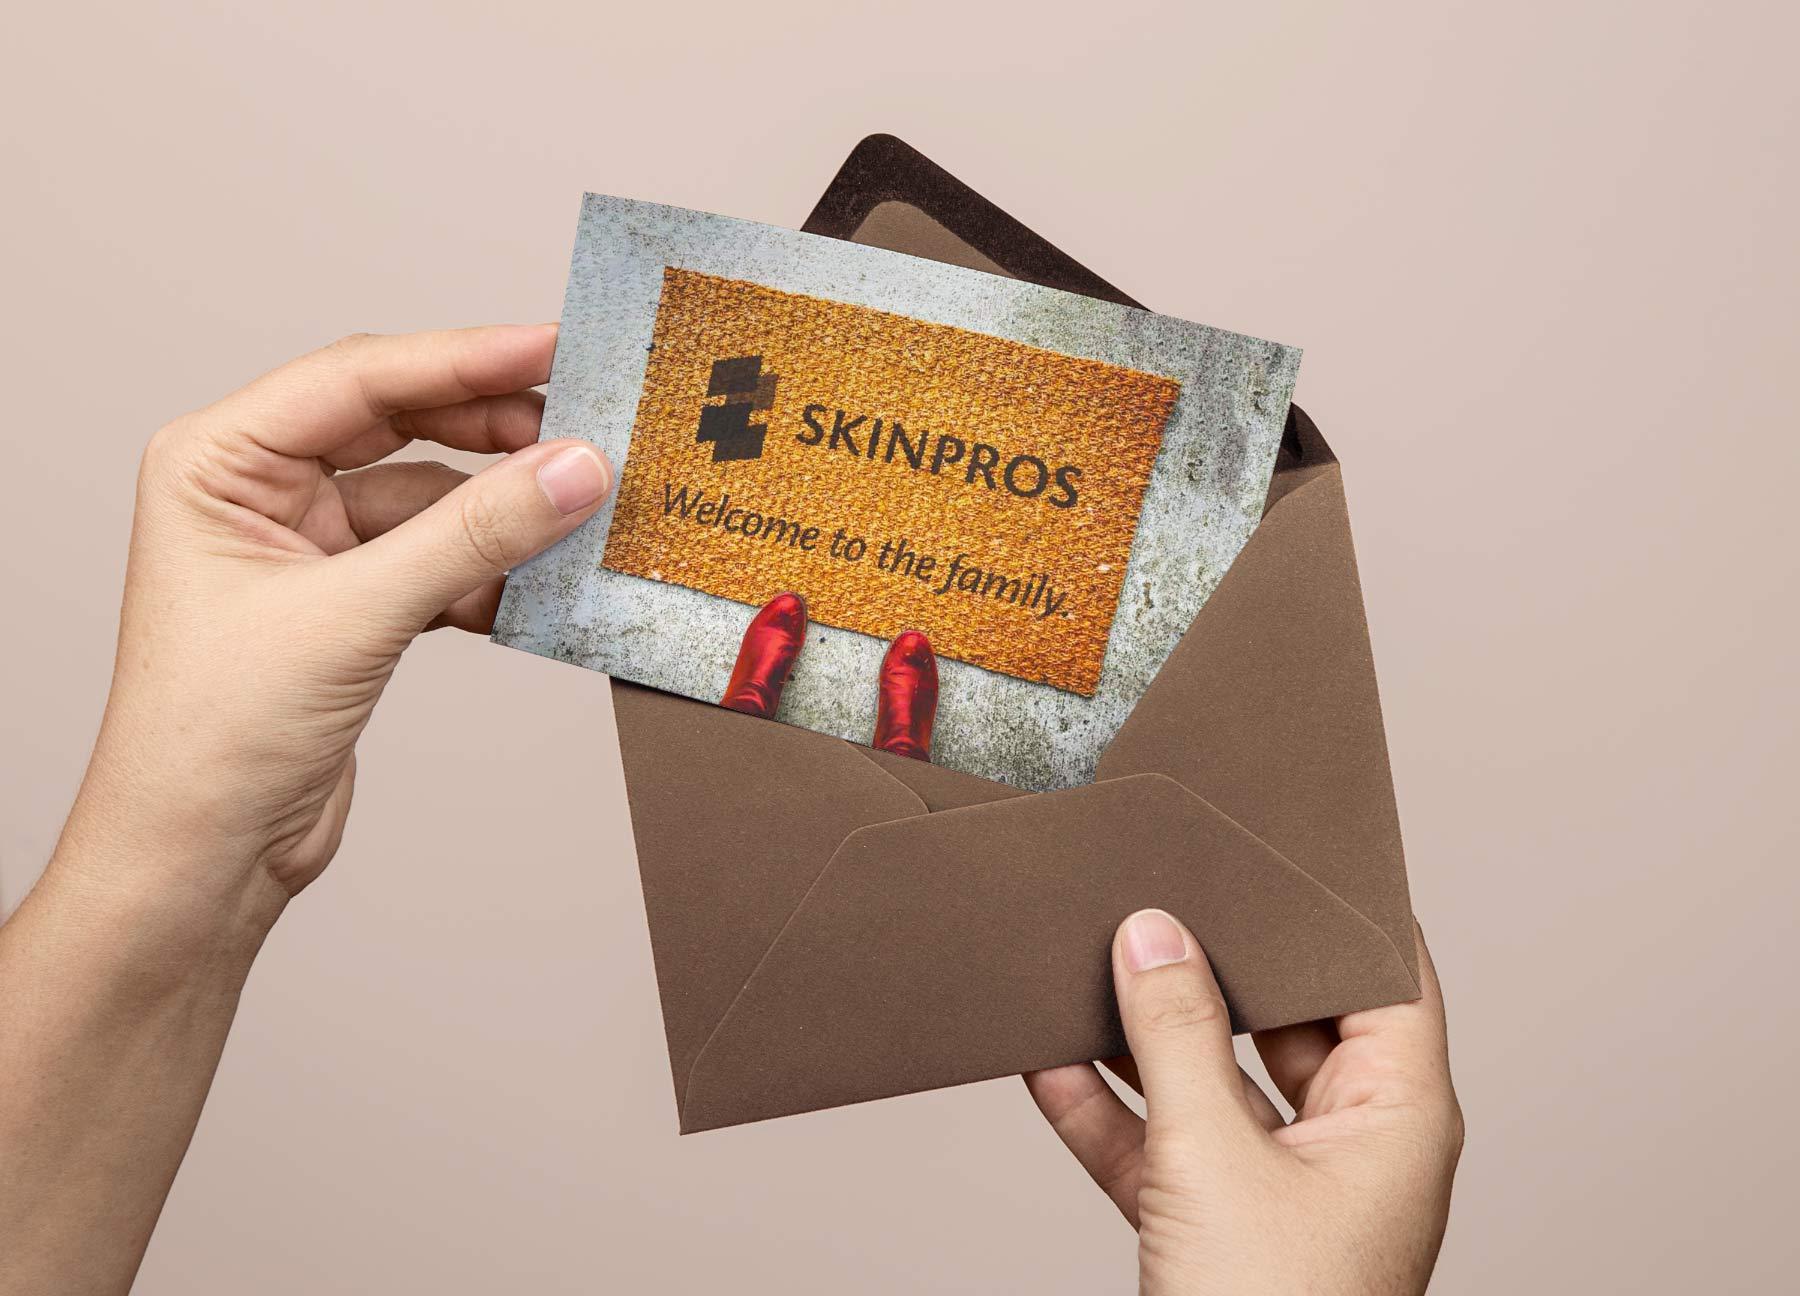 SkinPros patient welcome postcard design